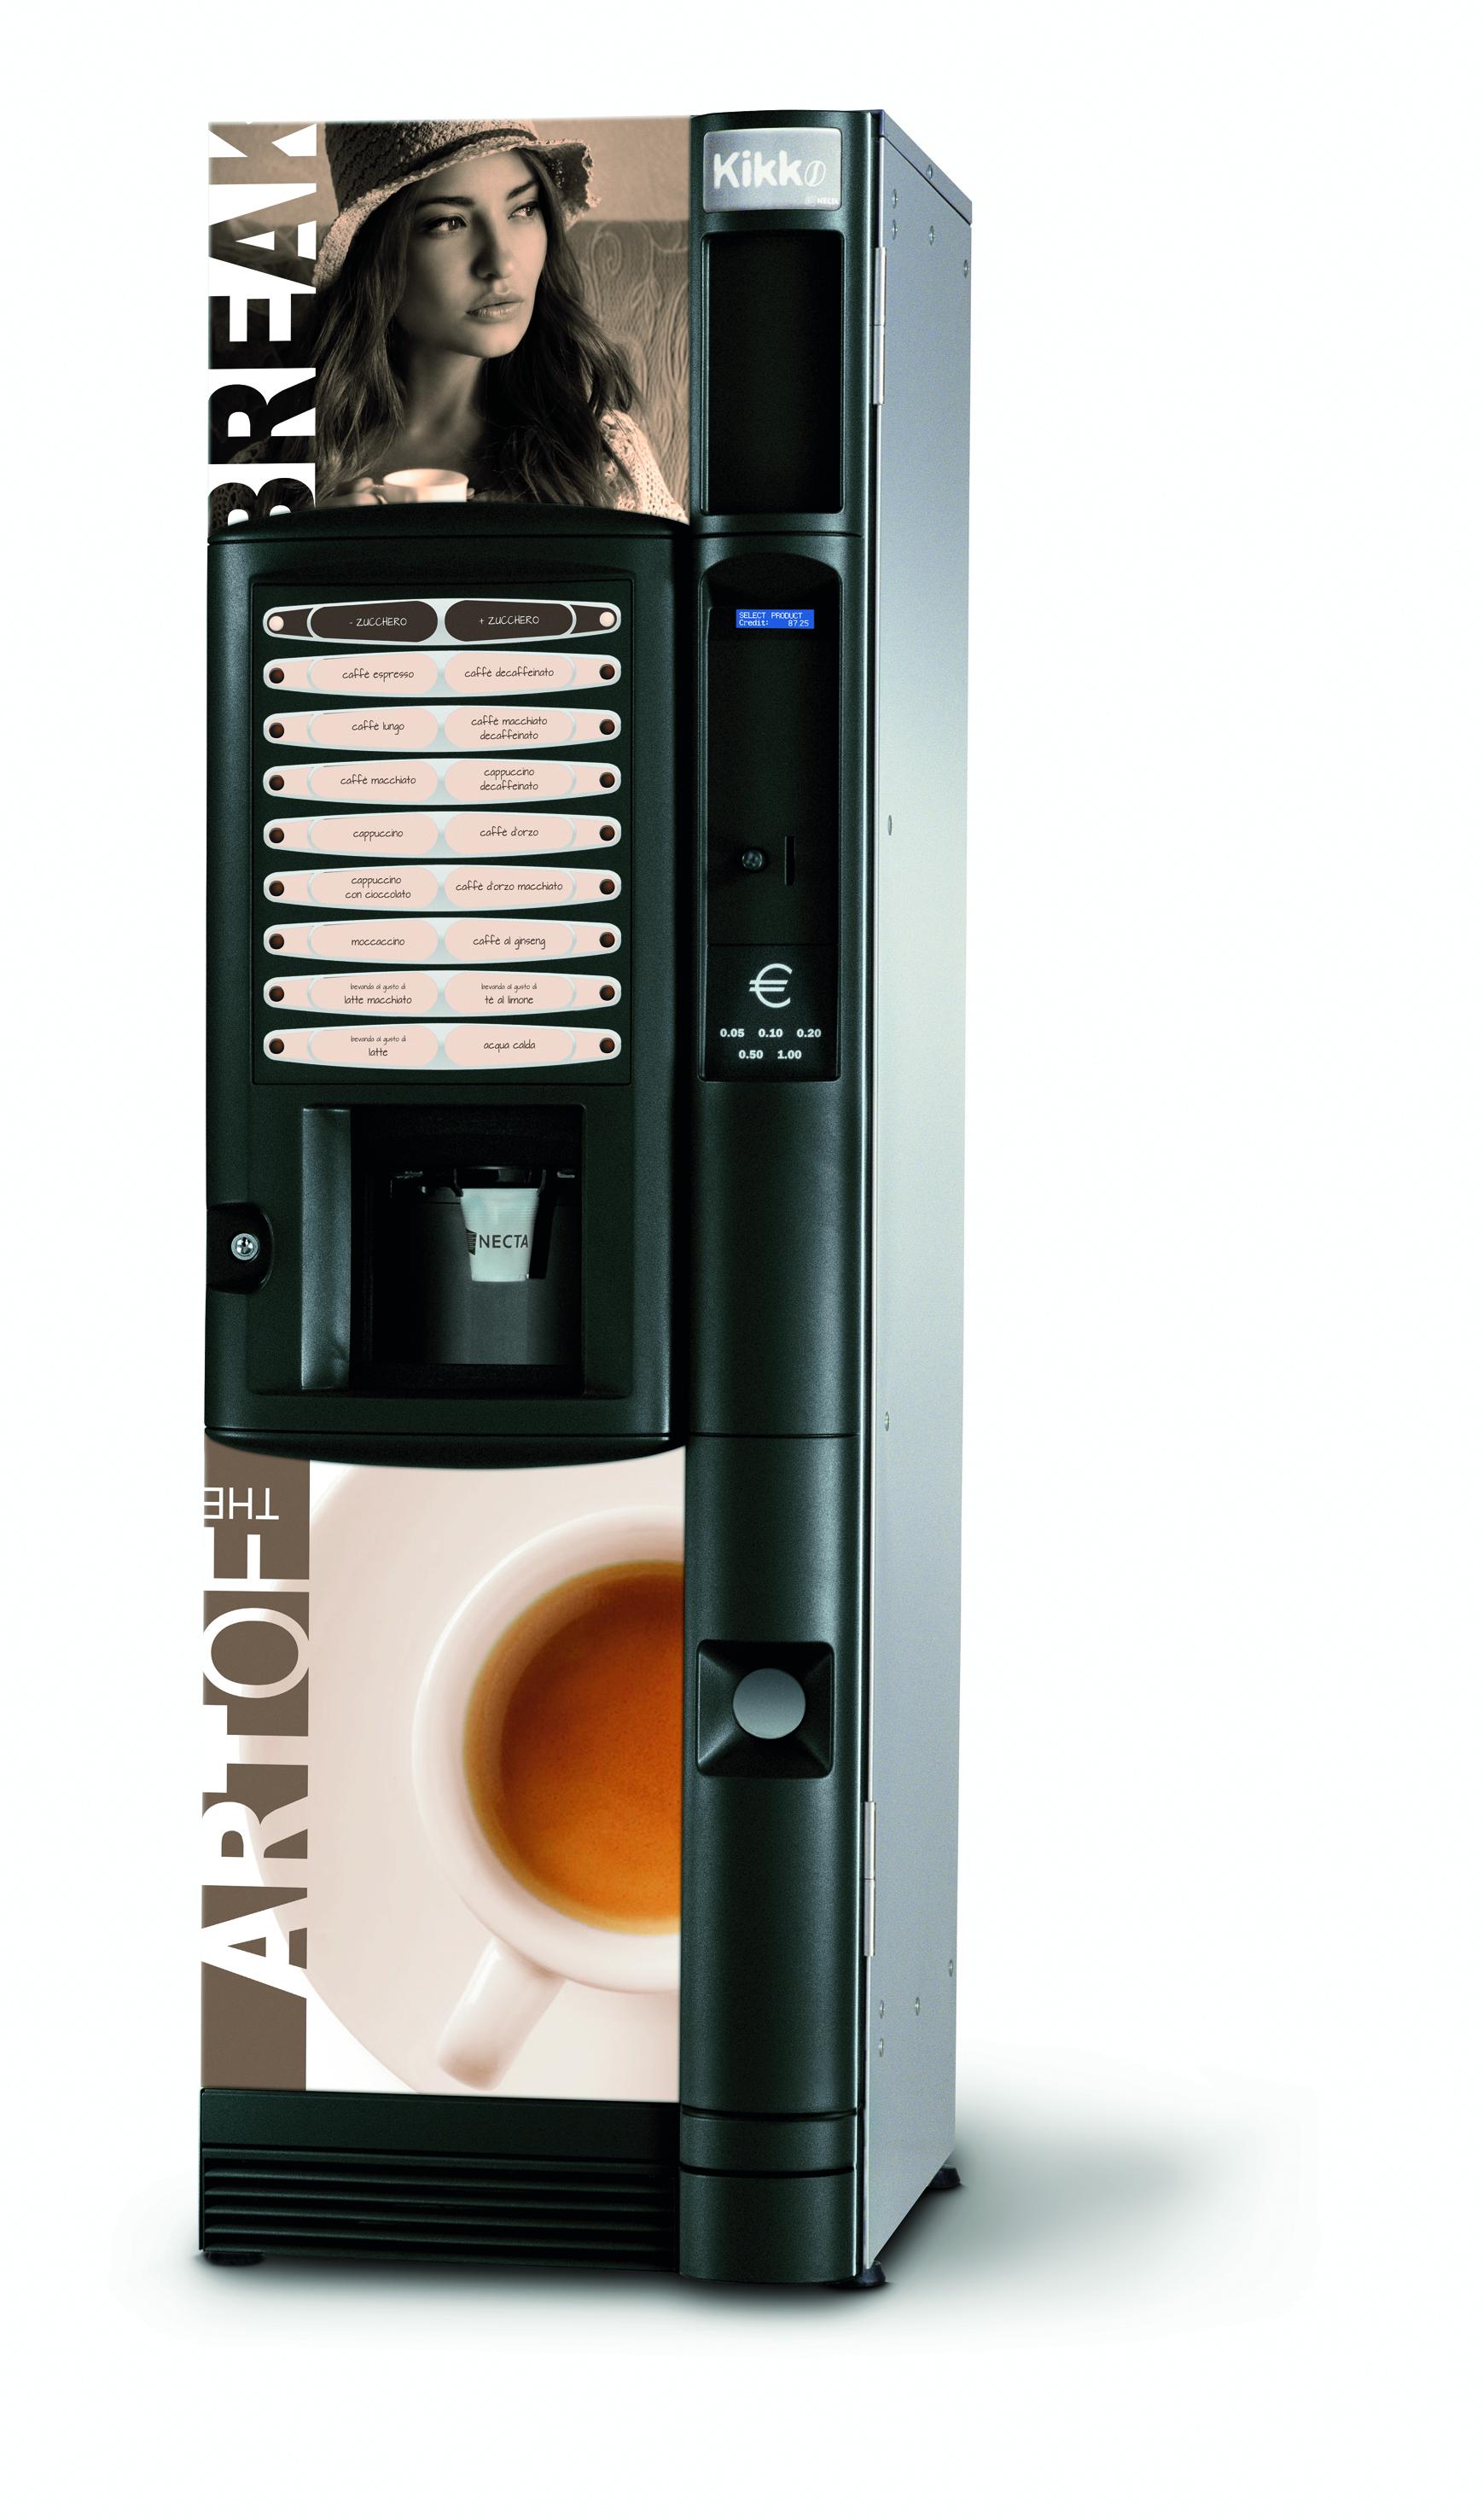 Automatici-Medie utenze